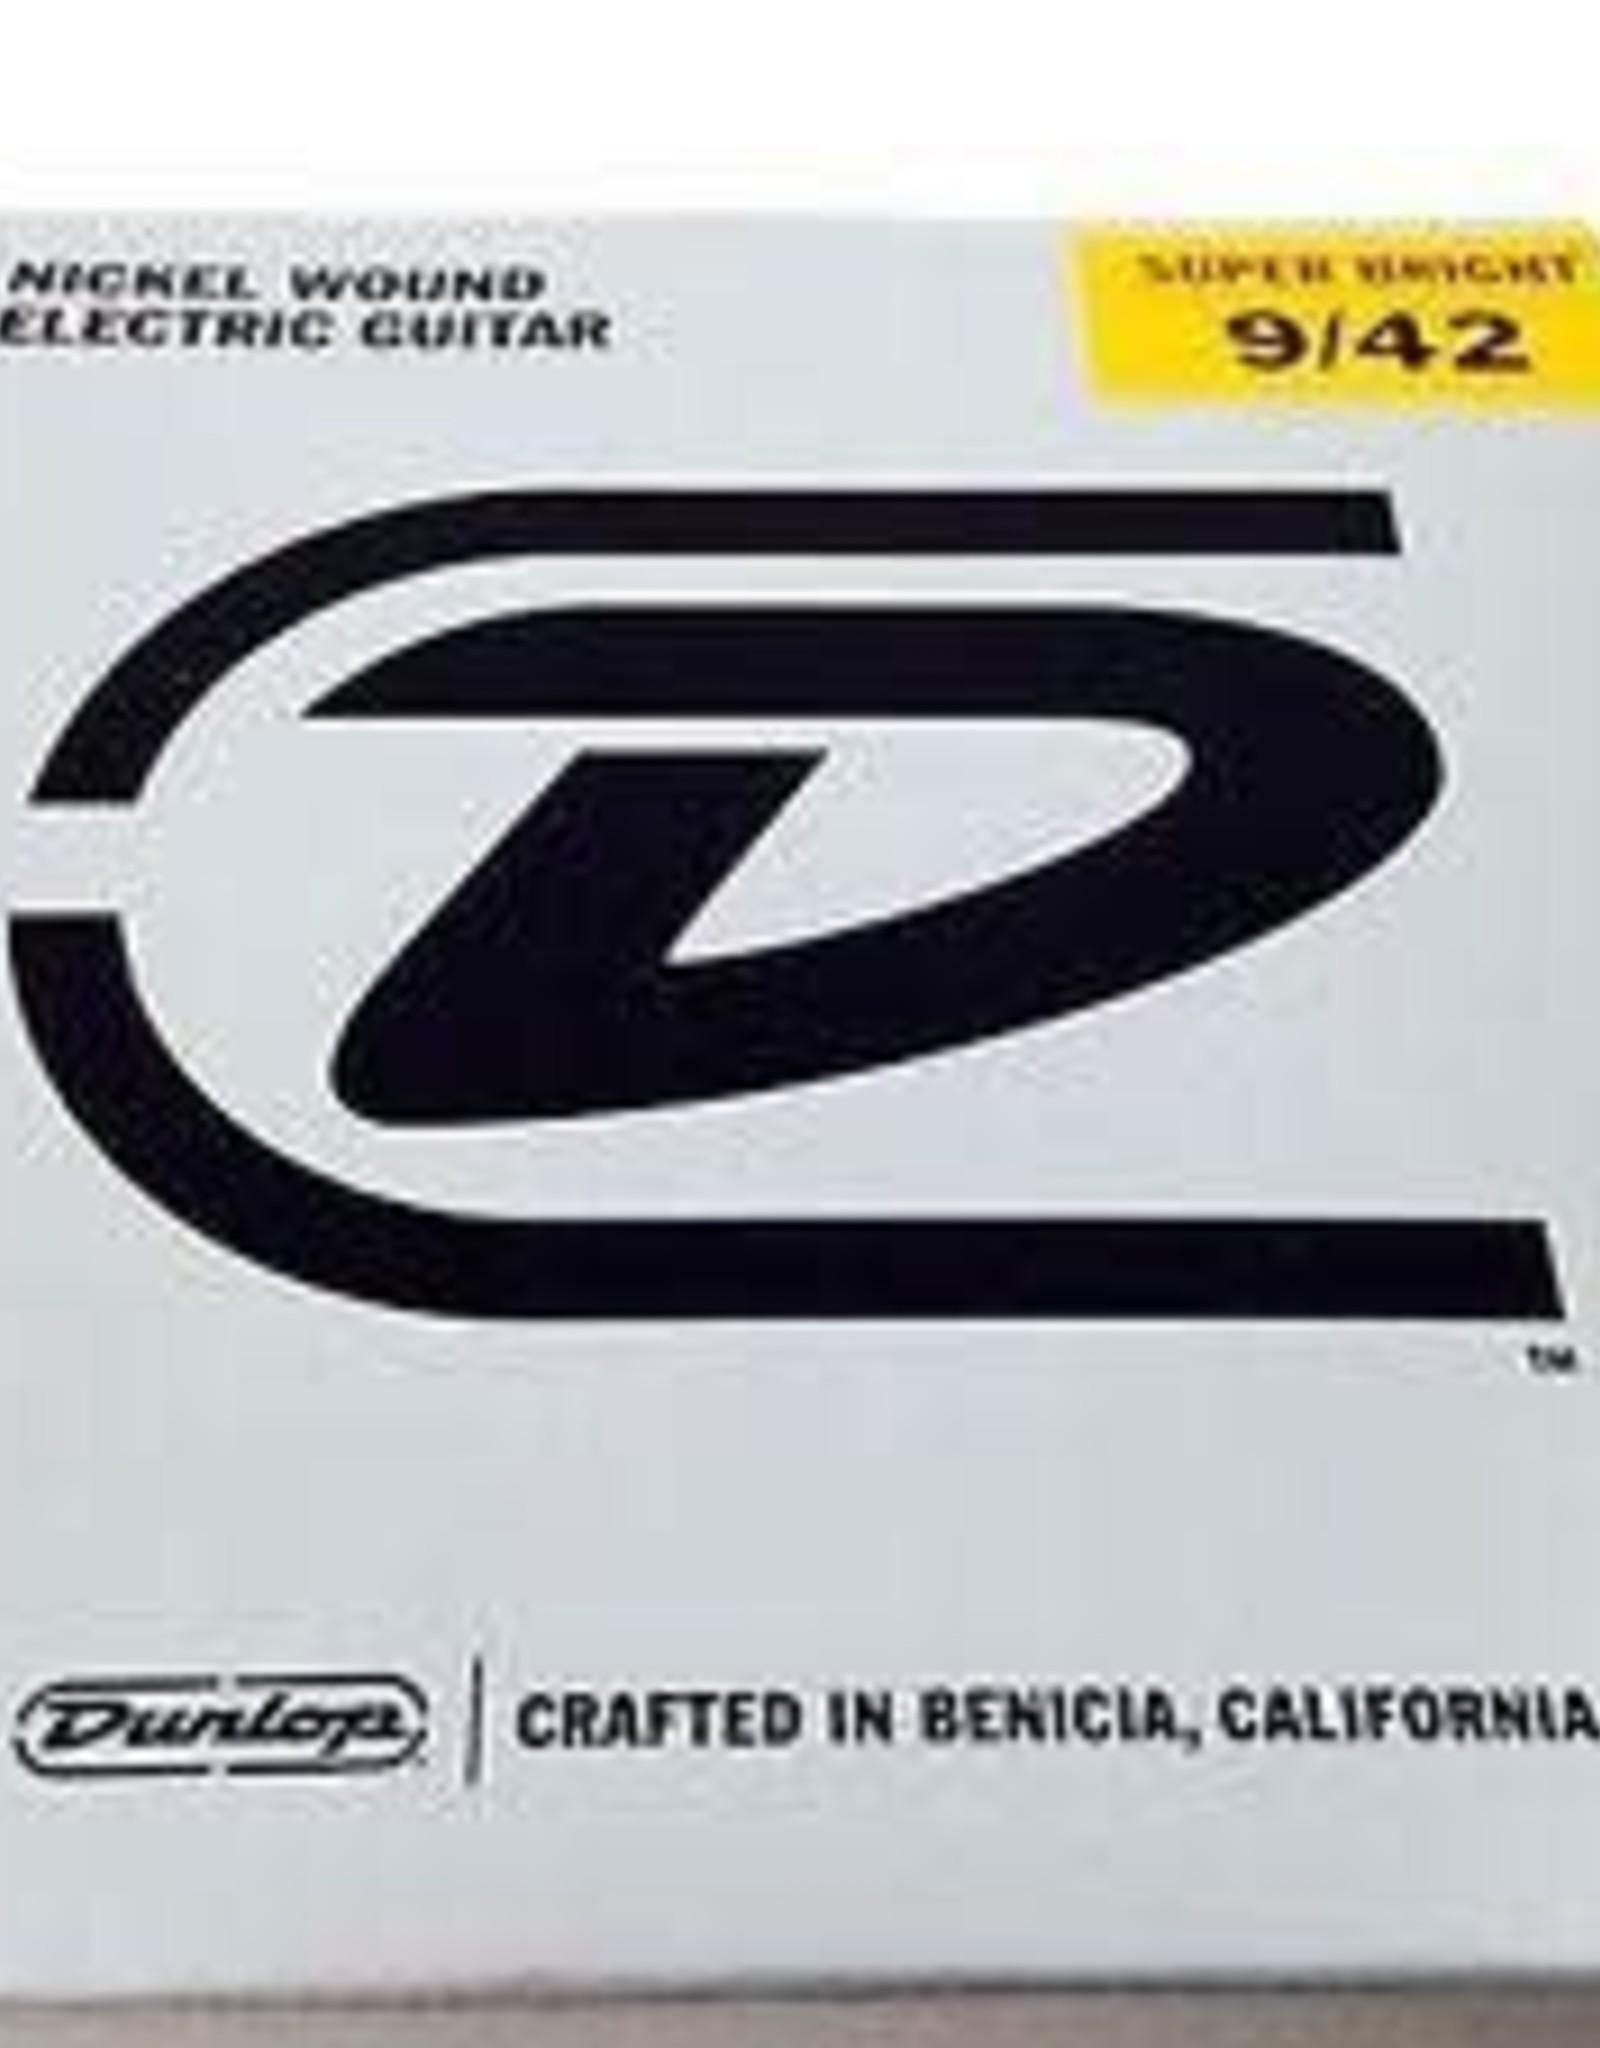 Dunlop Dunlop Super Bright Electric Strings - .009-.042 Light